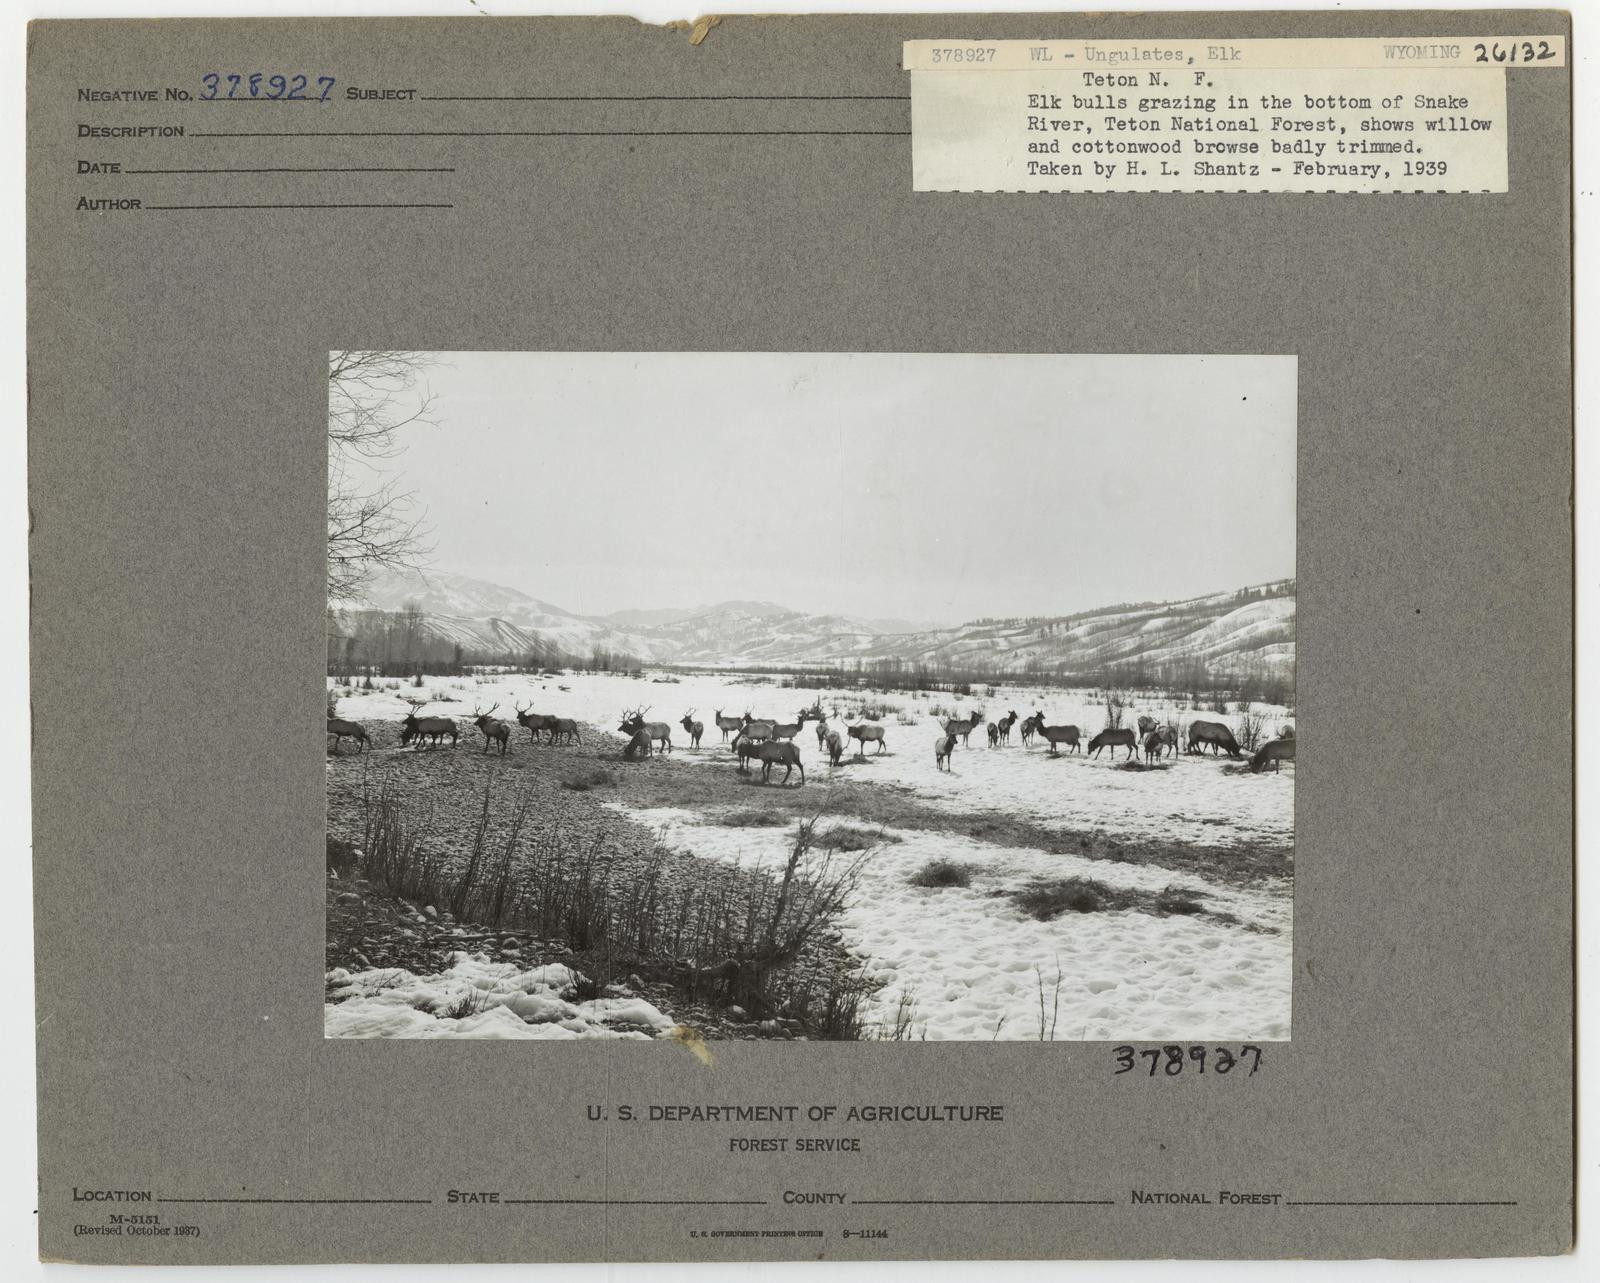 Ungulates: Elk - Wyoming